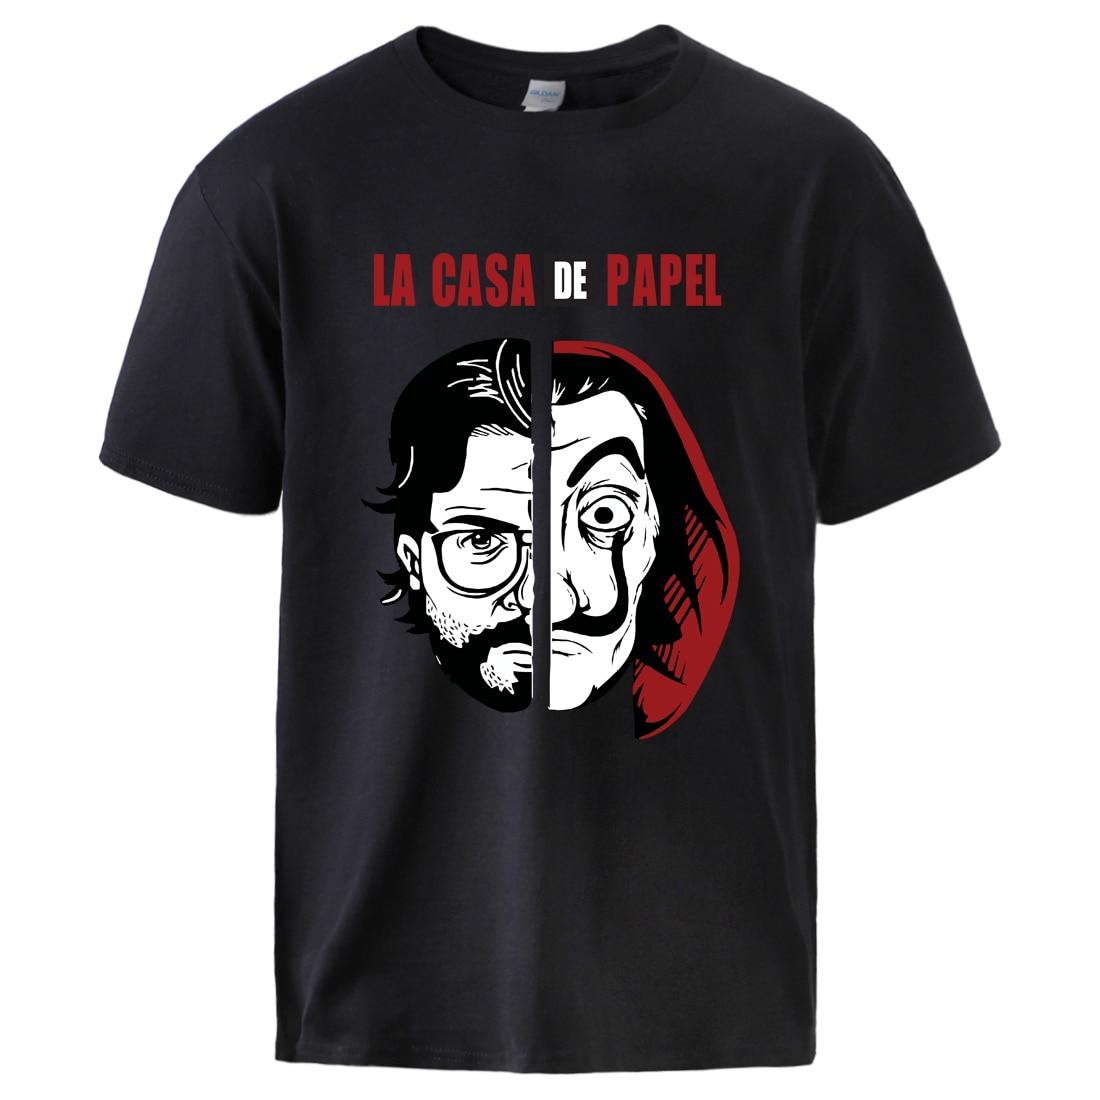 La Casa De Papel Horror Movie Tshirts Man Causal Loose Cotton T shirt 2020 Summer Short Sleeve Sportswear T shirts Male Cool Top